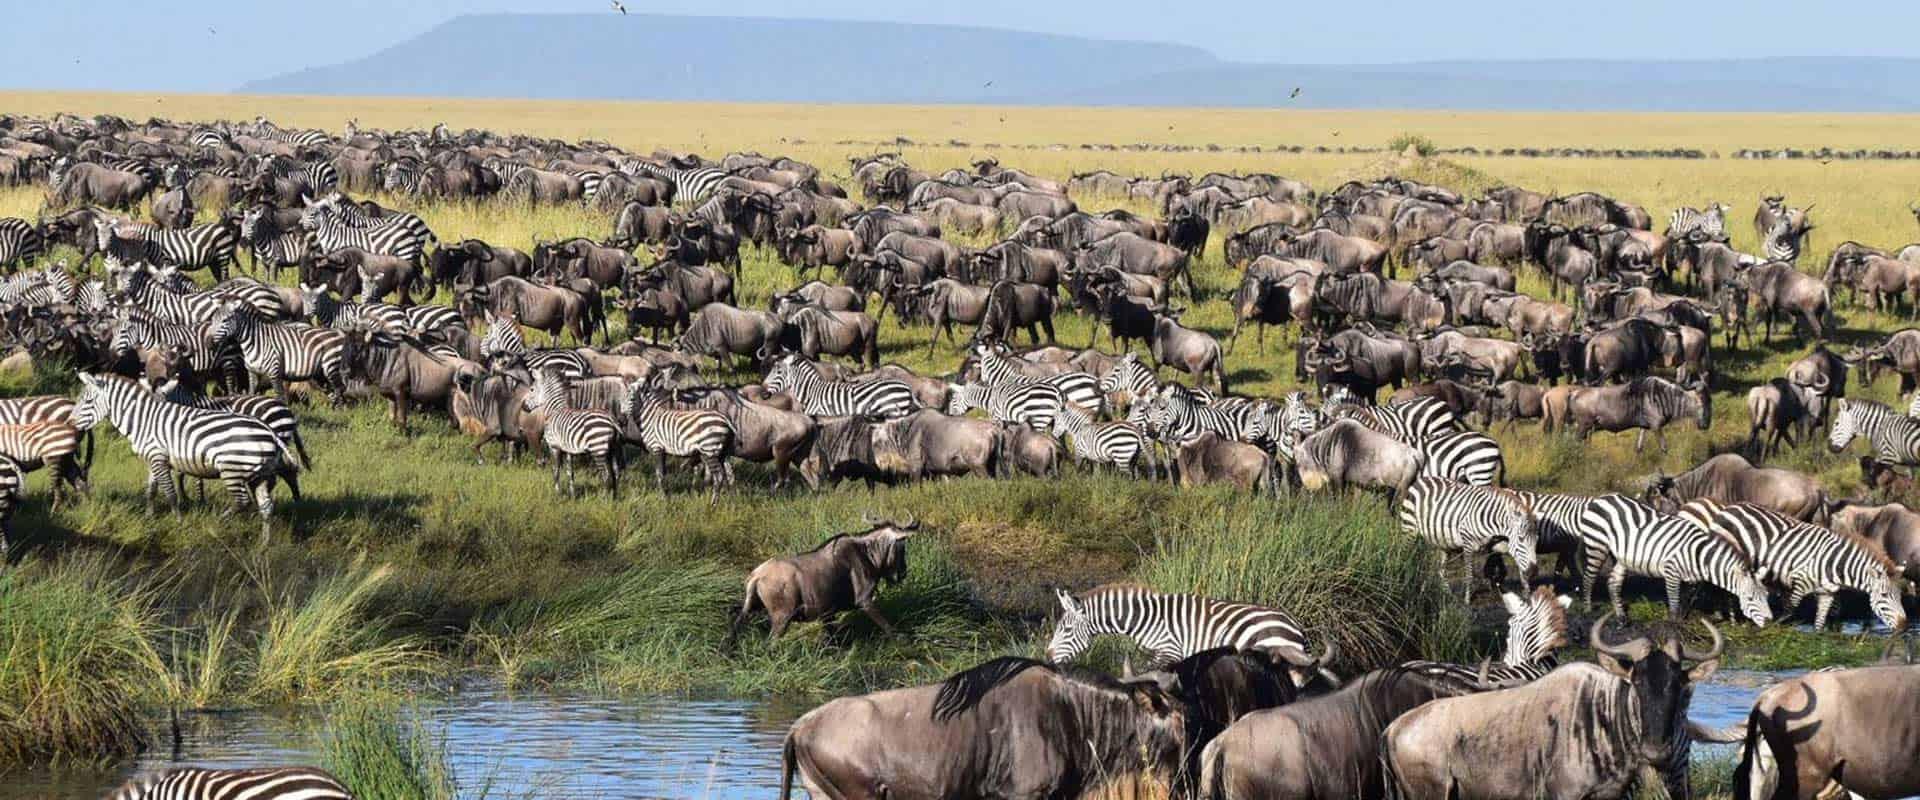 Choose a Good Safari